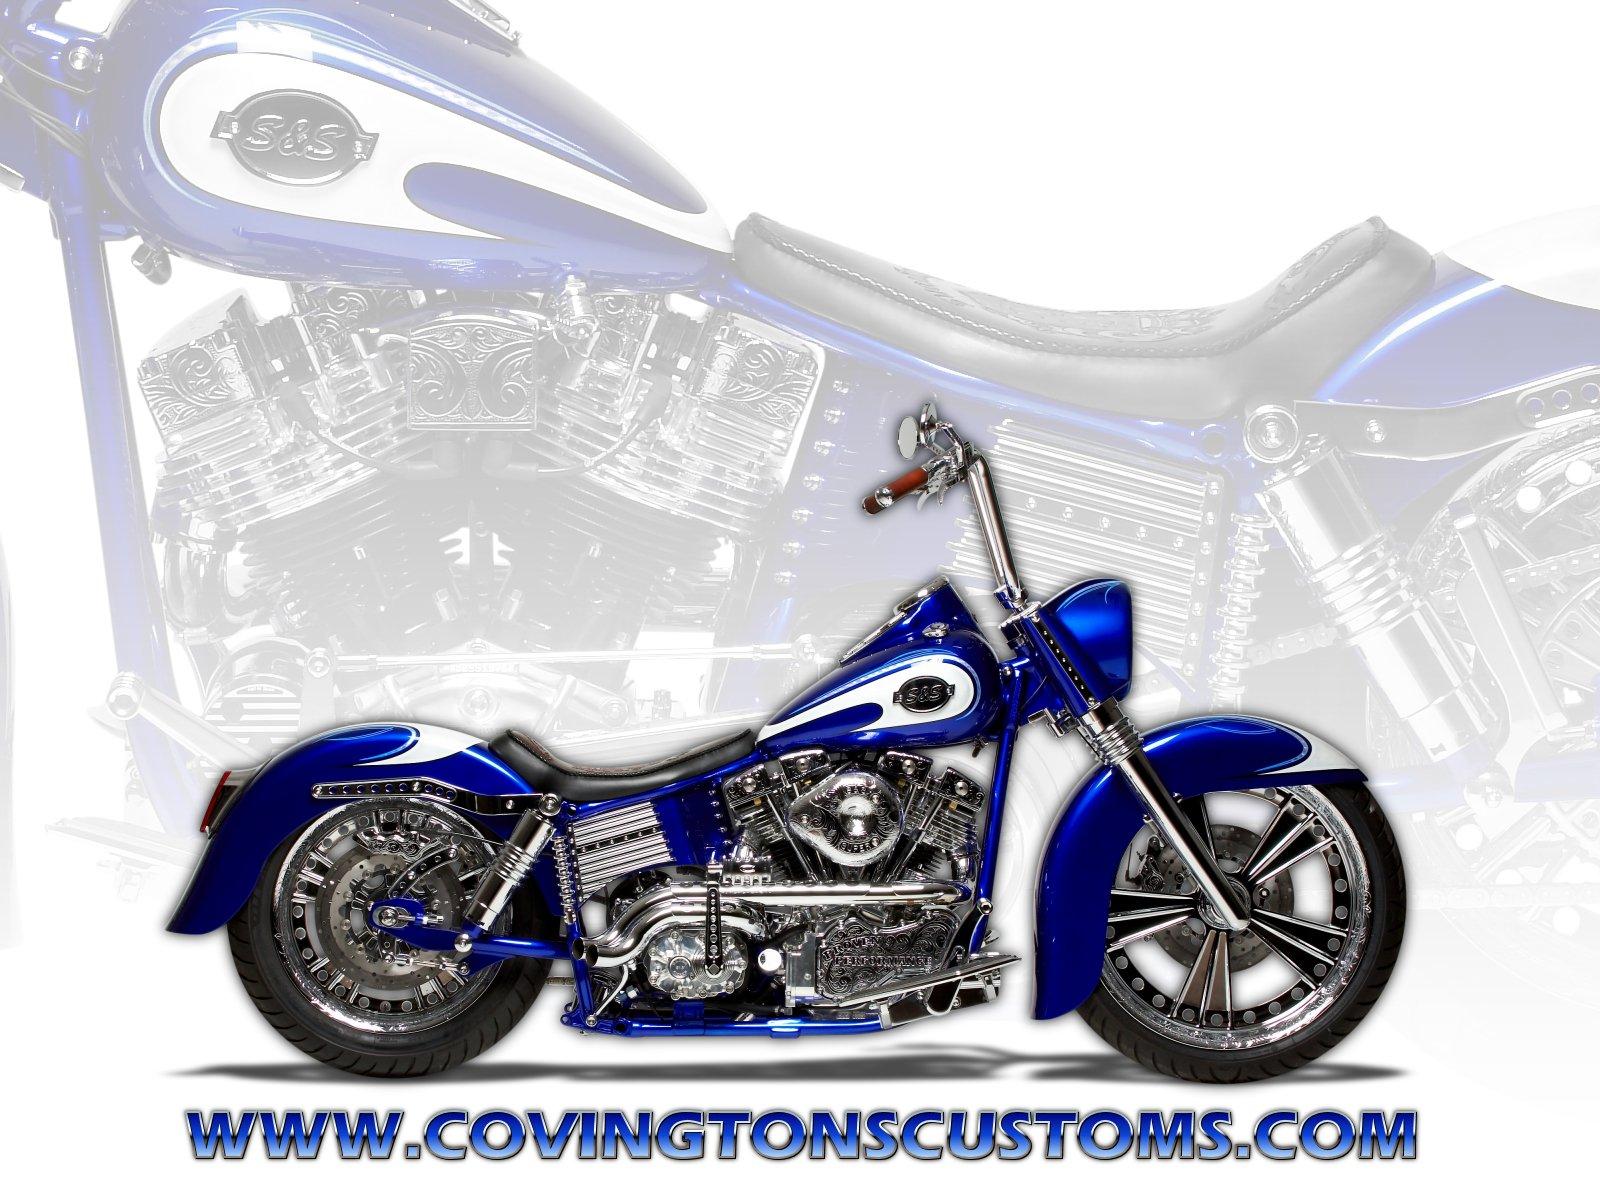 Véhicules - Motocycle  Fond d'écran